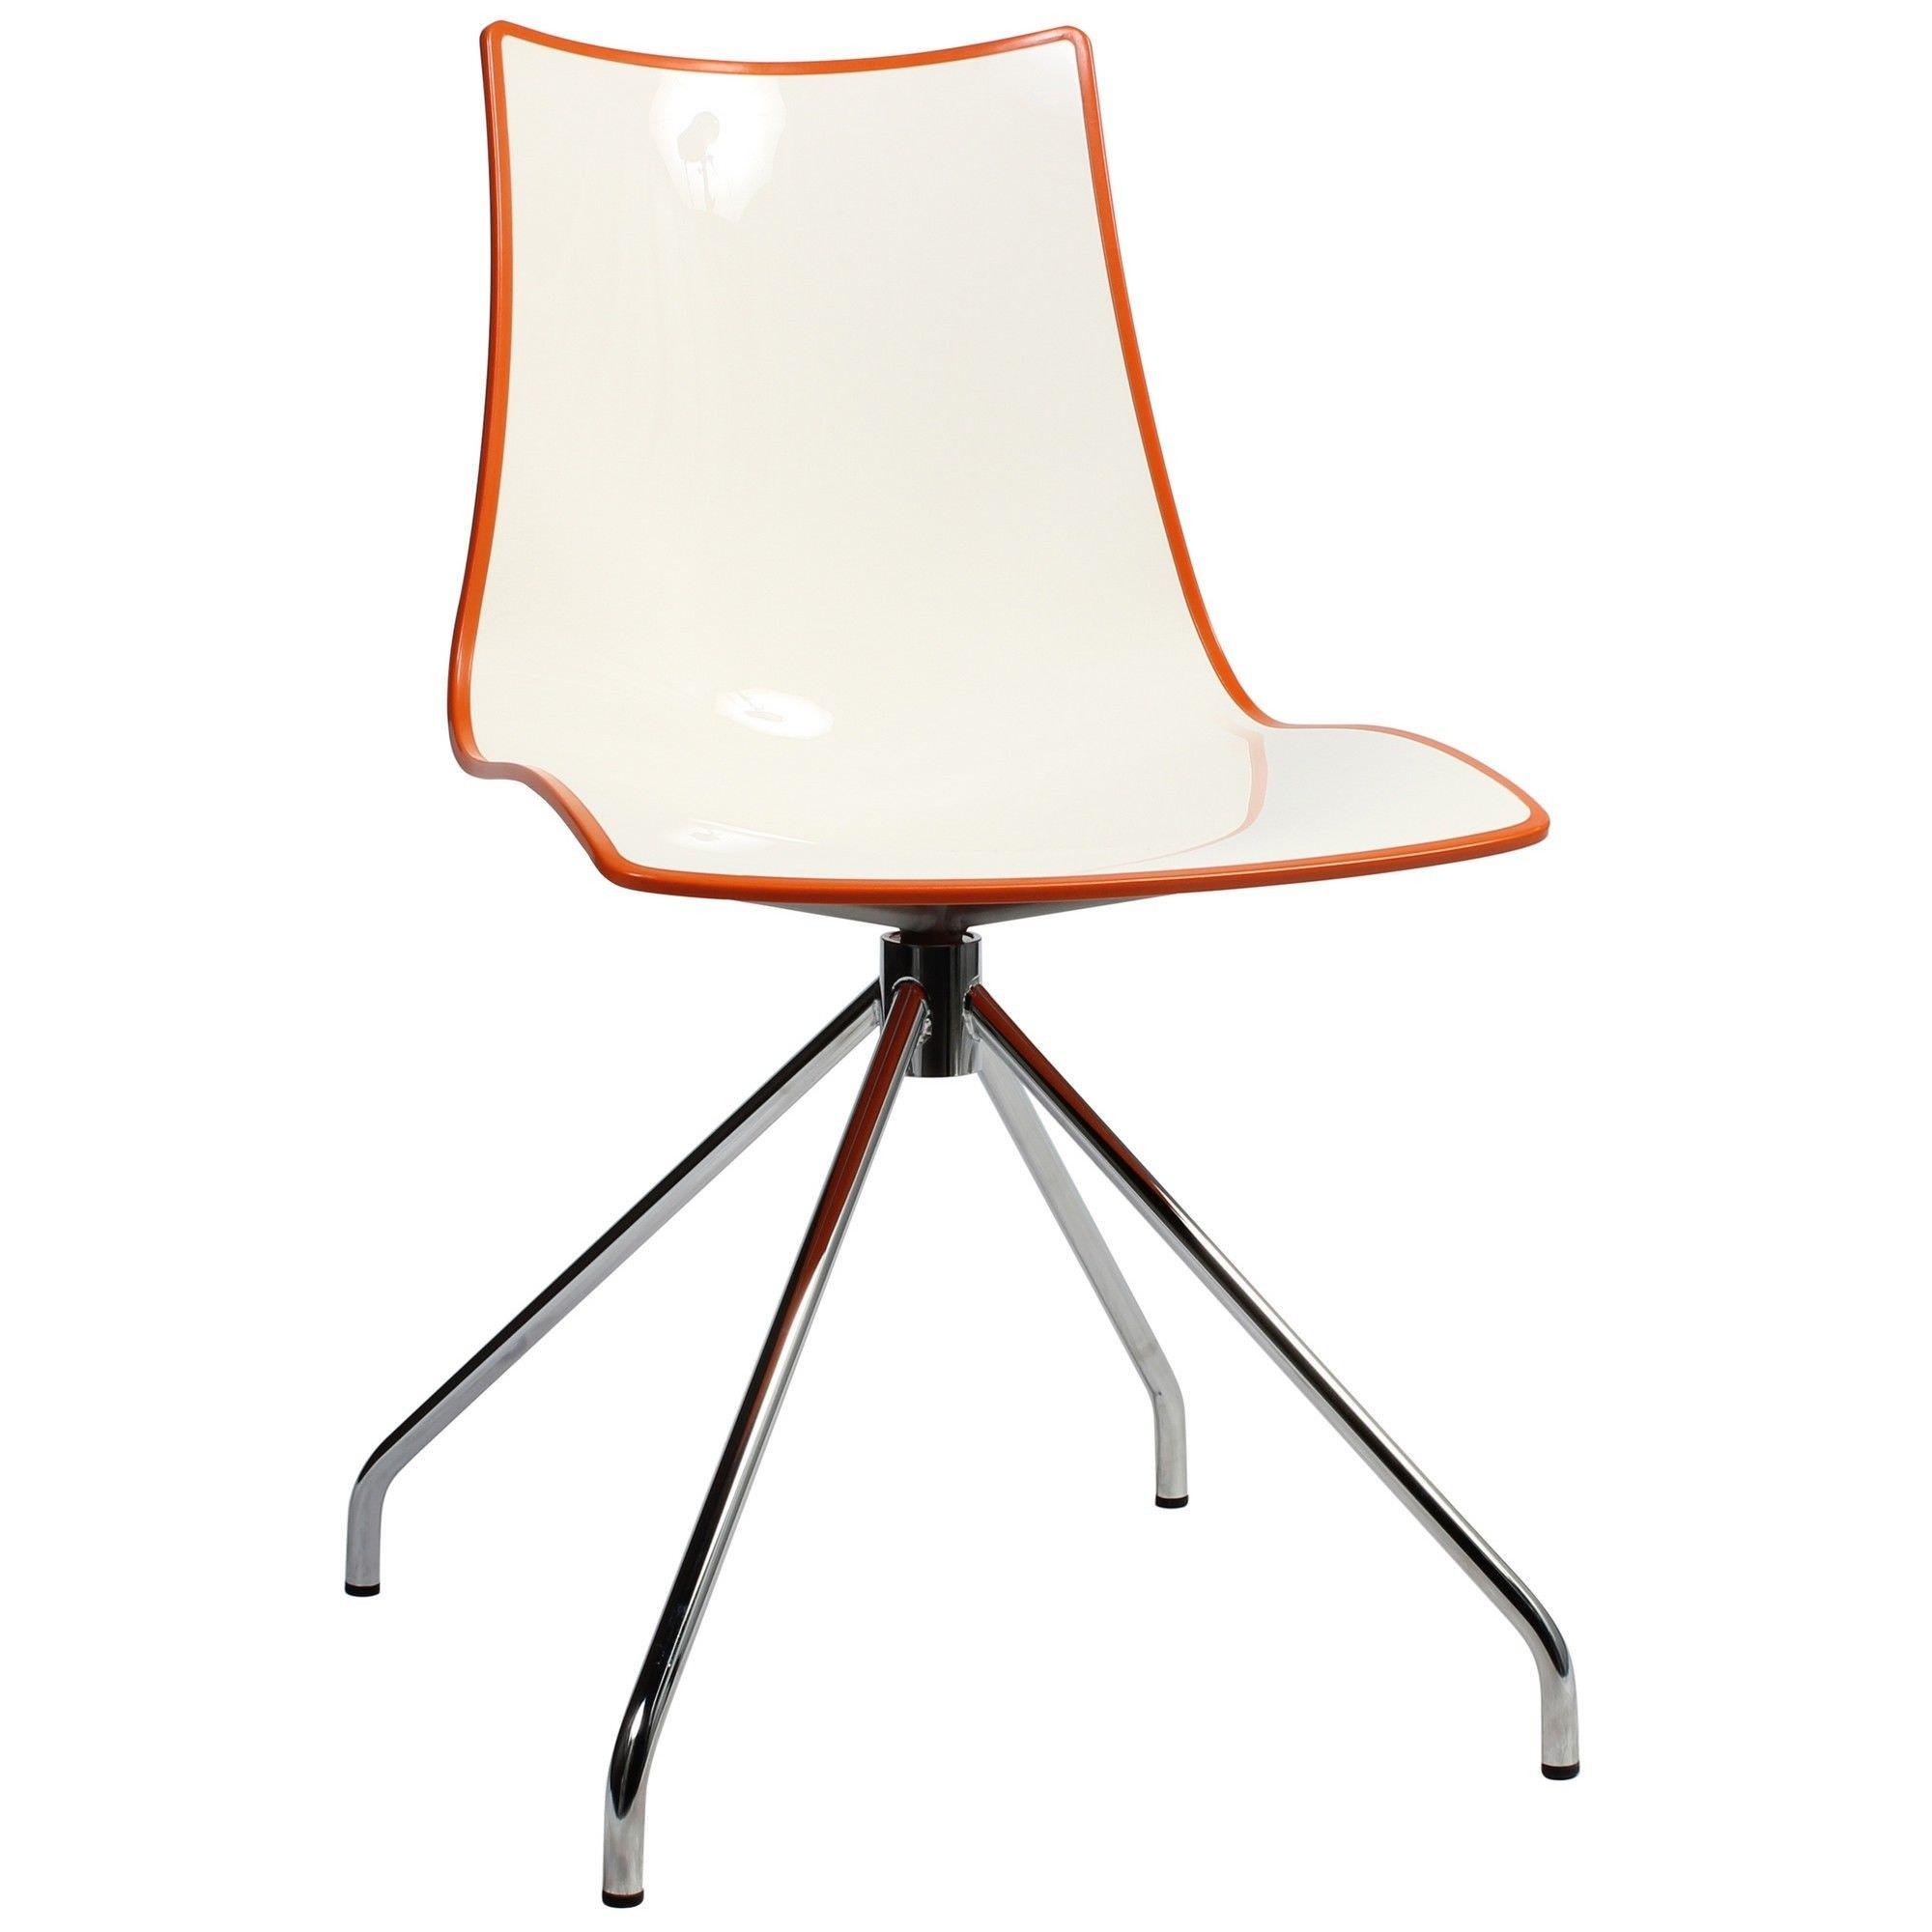 Zebra Bicolore Italian Made Commercial Grade Dining Chair, Trestle Leg, Orange / Chrome